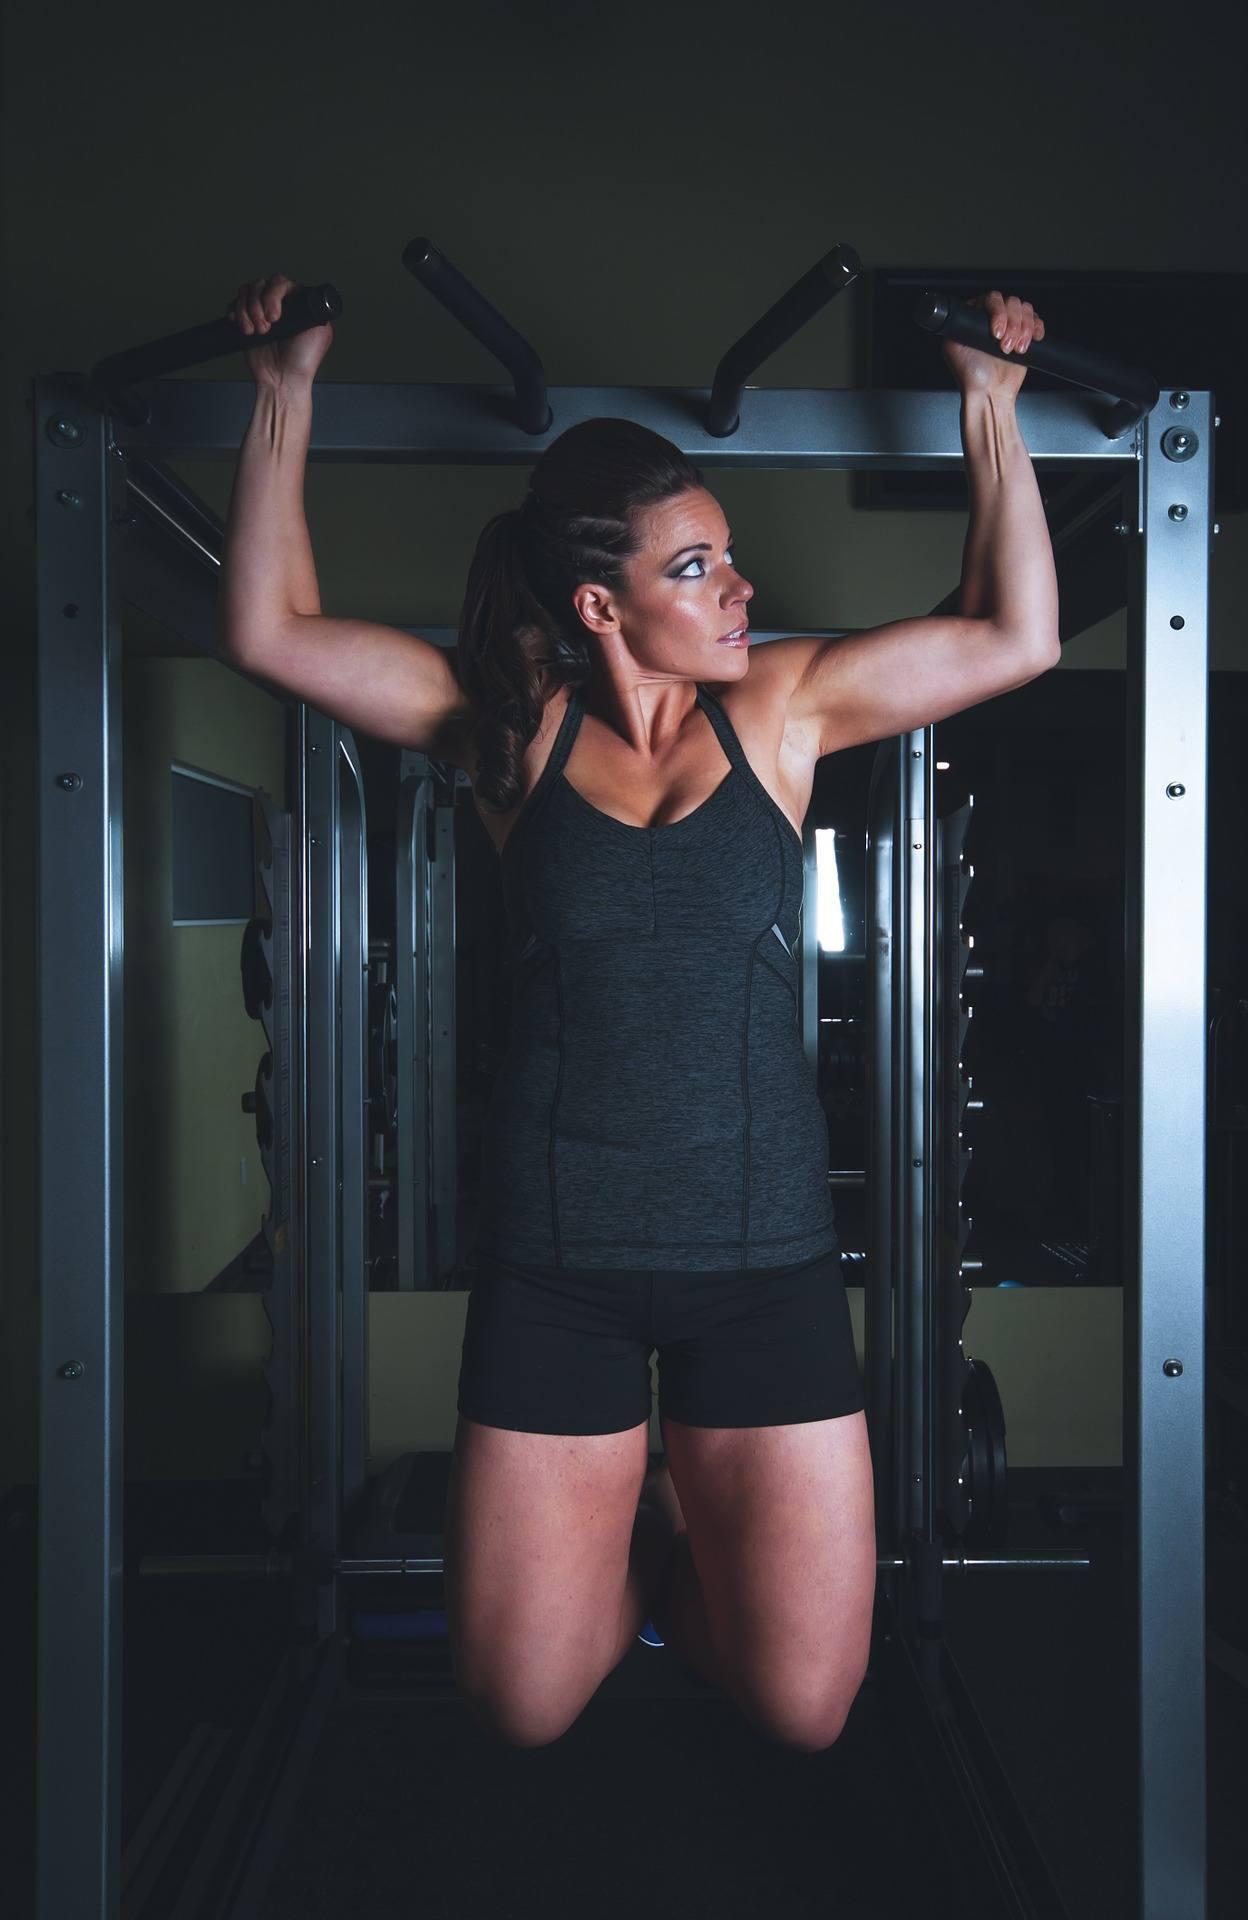 boxing abdominal workout